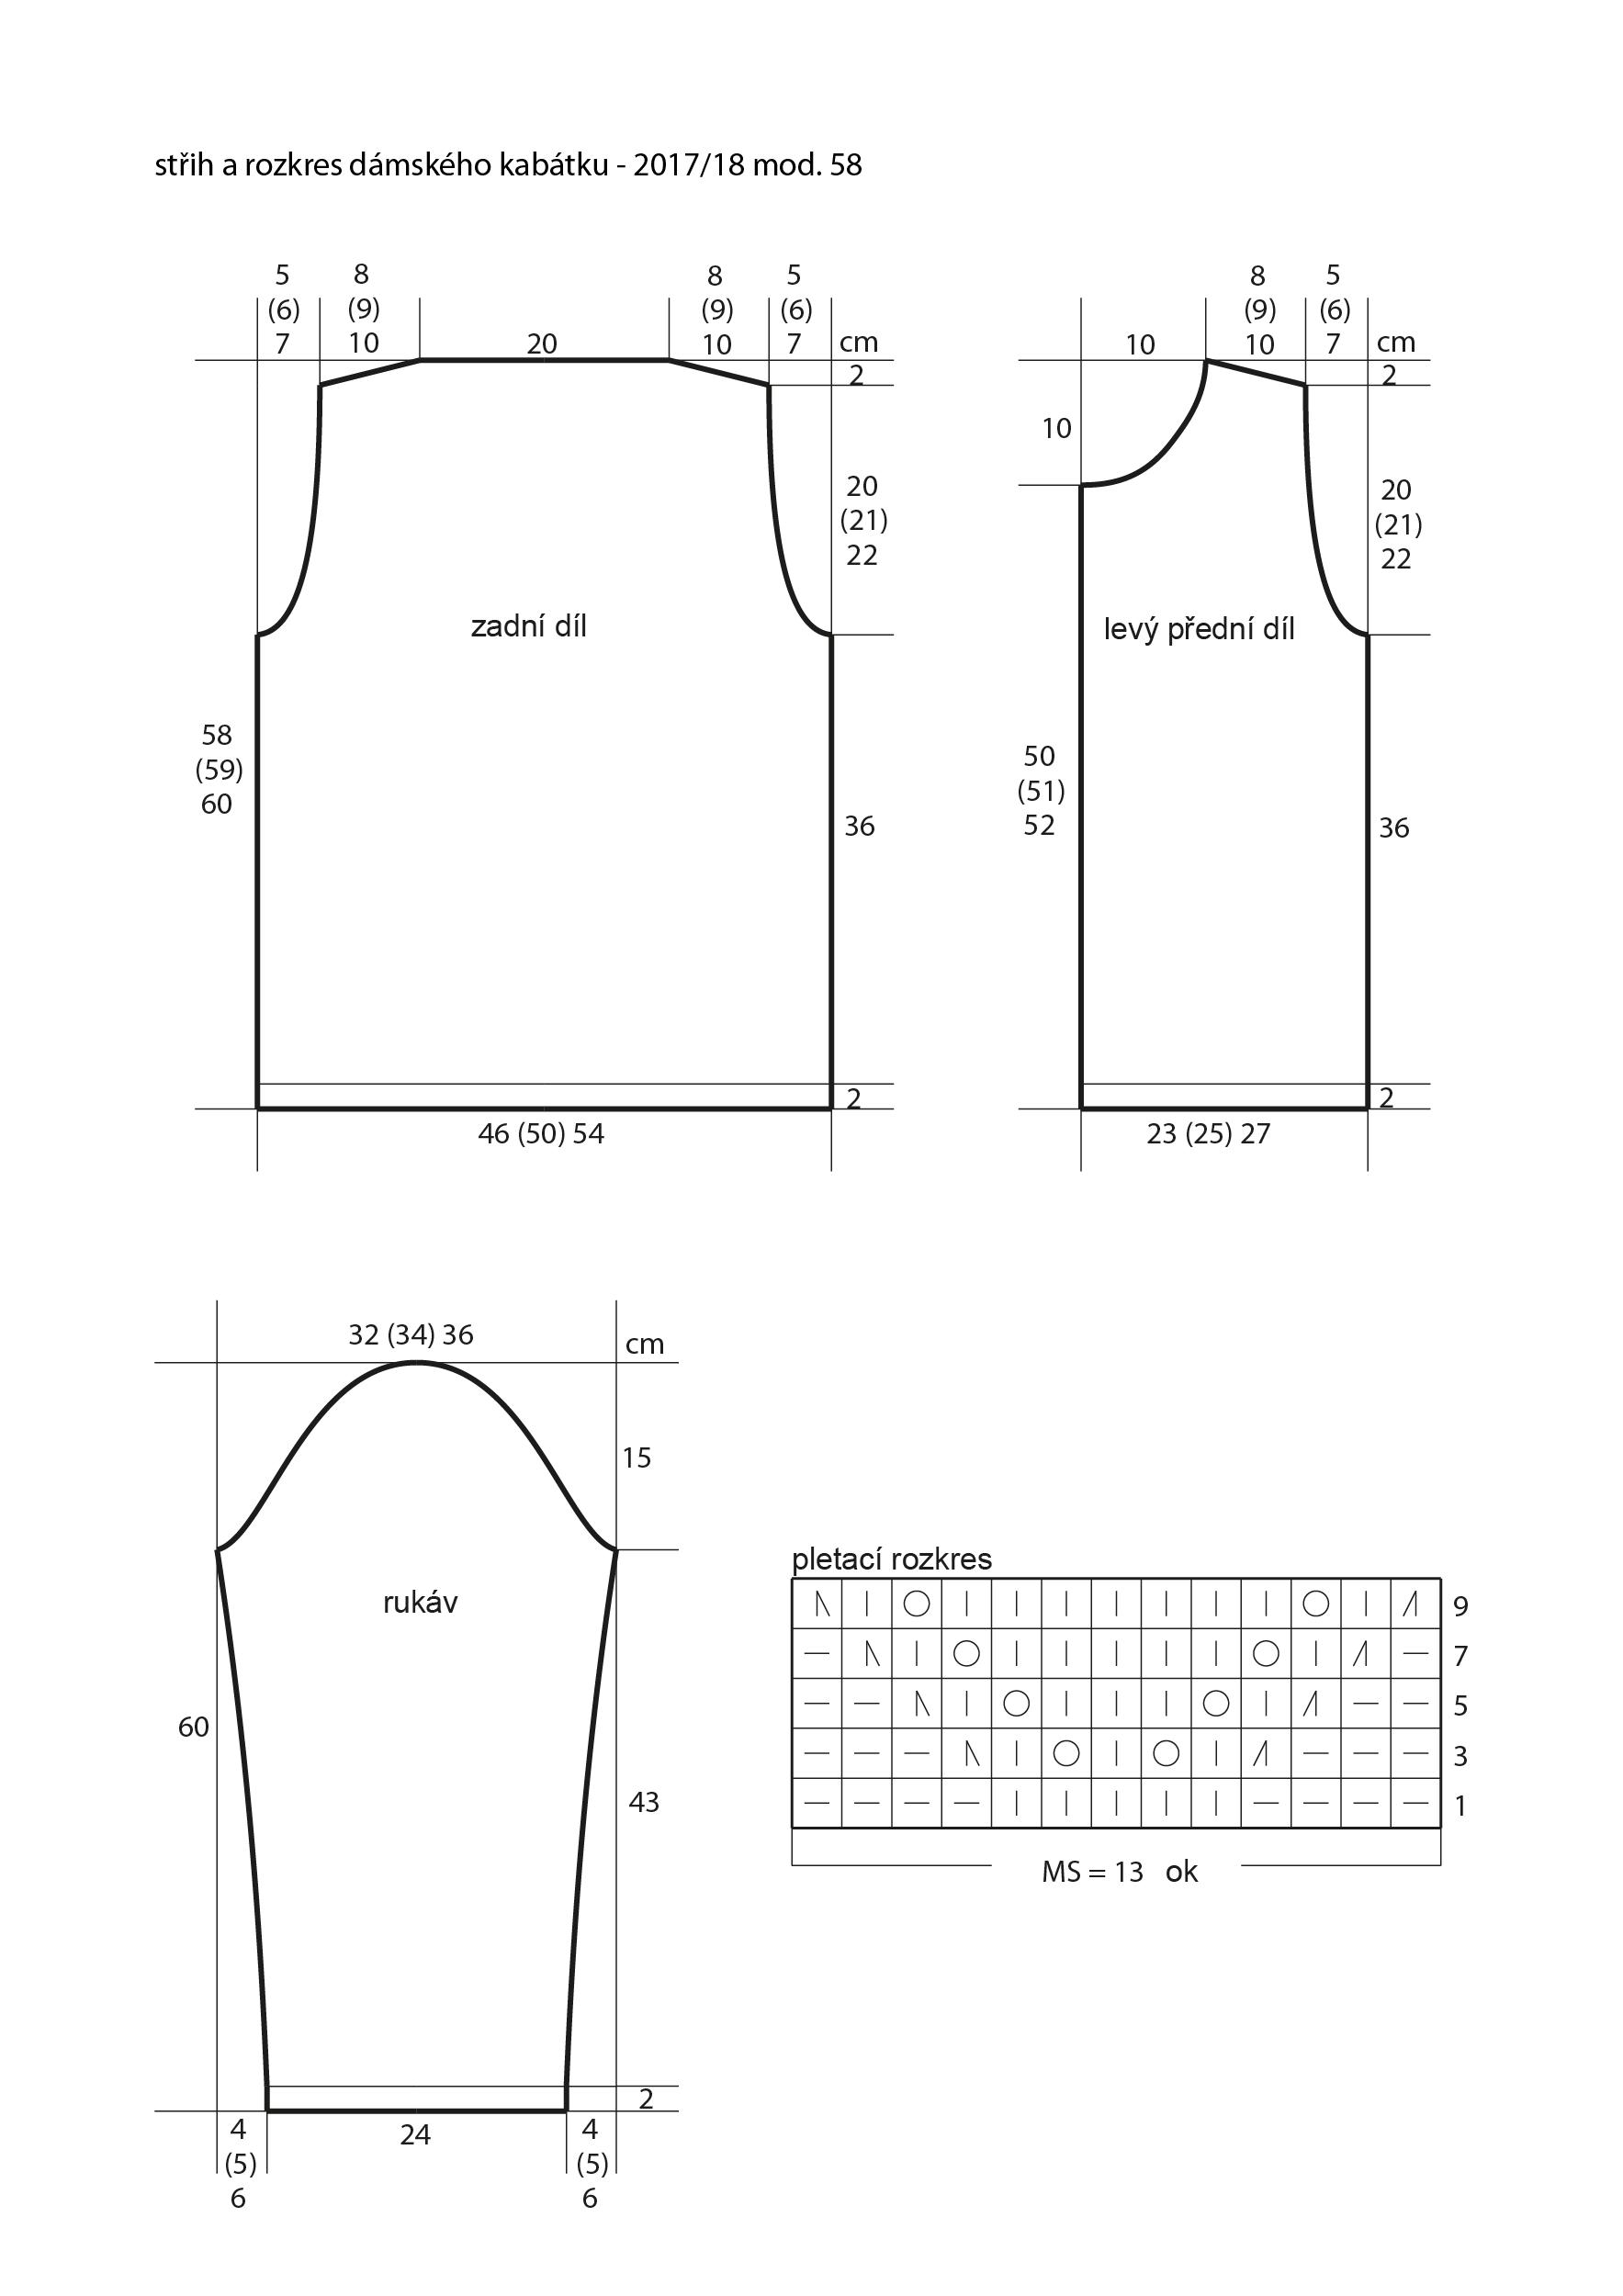 2017-2018 model 58 střih a rozkres dámského pleteného kabátku